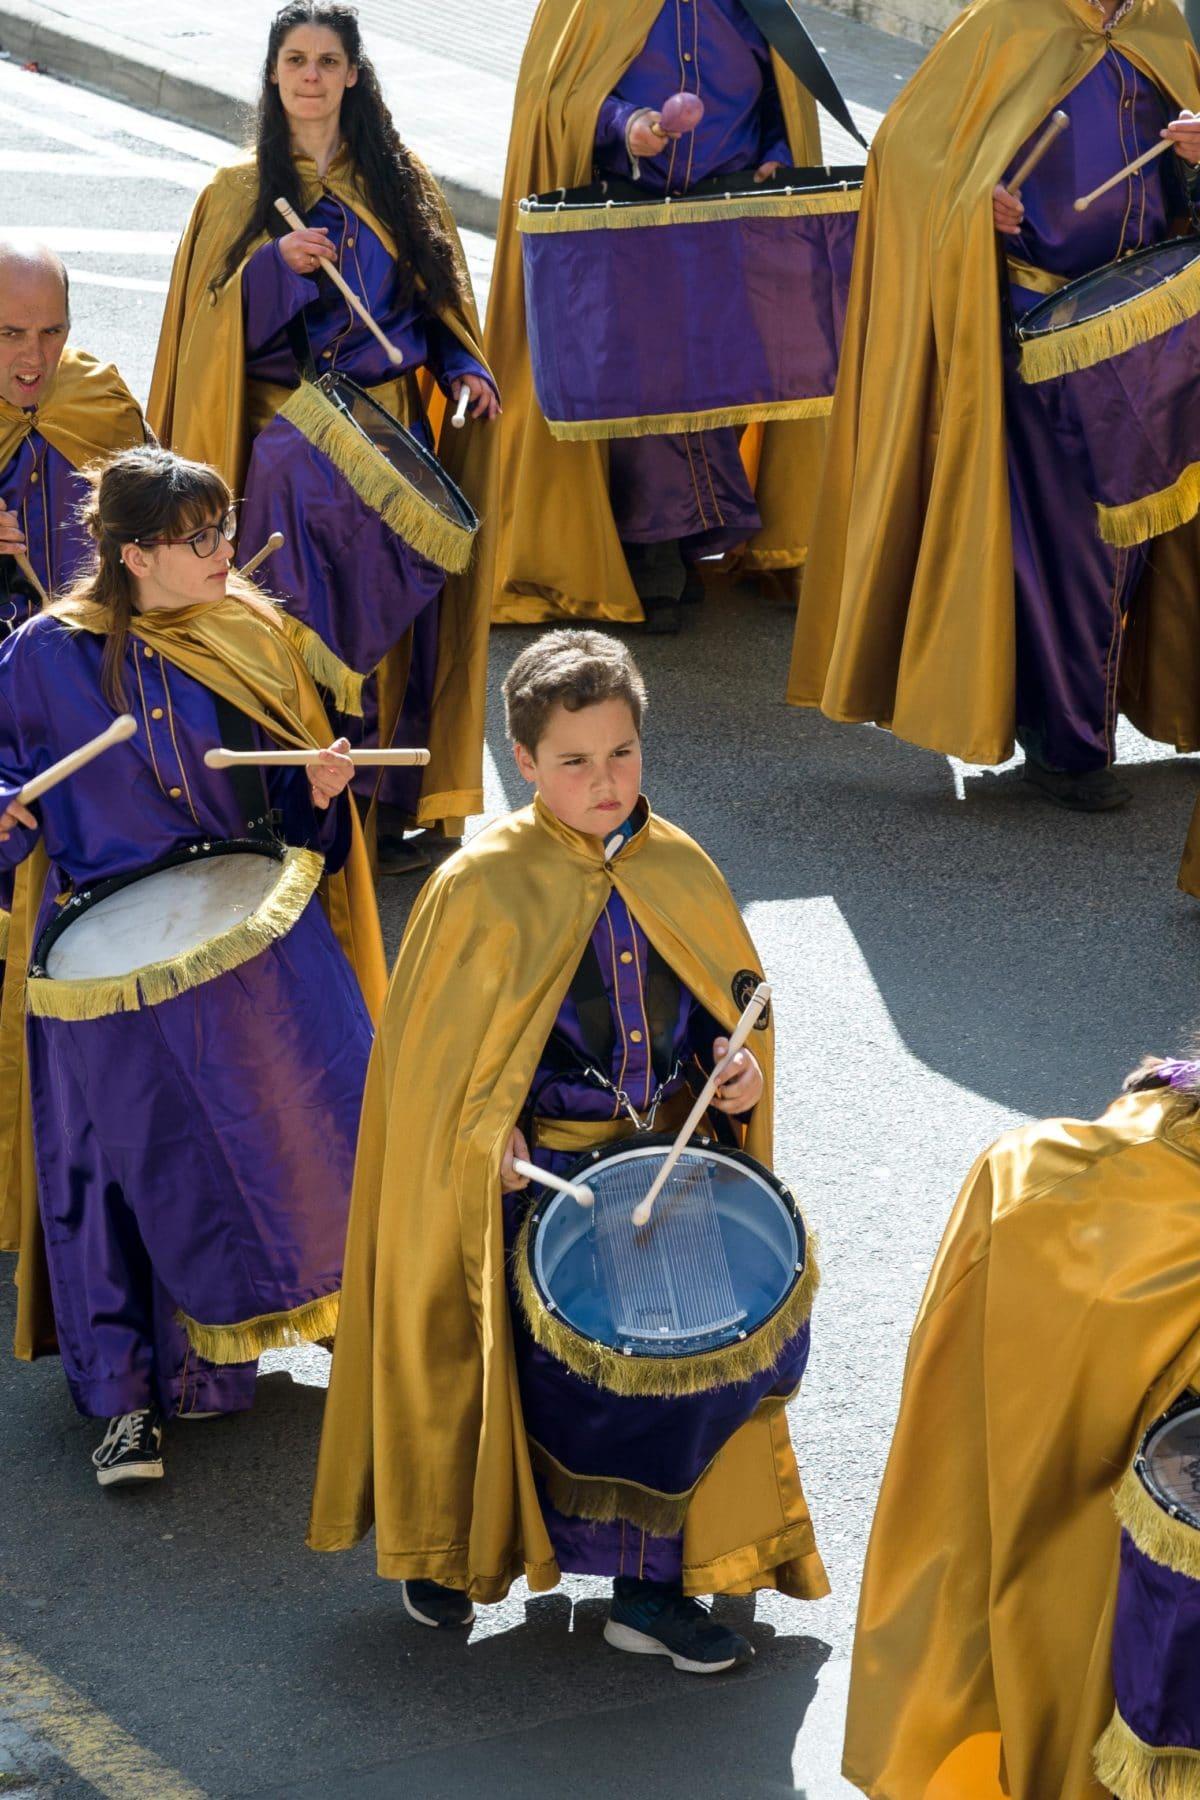 Cornetas y tambores retumban en Haro 9